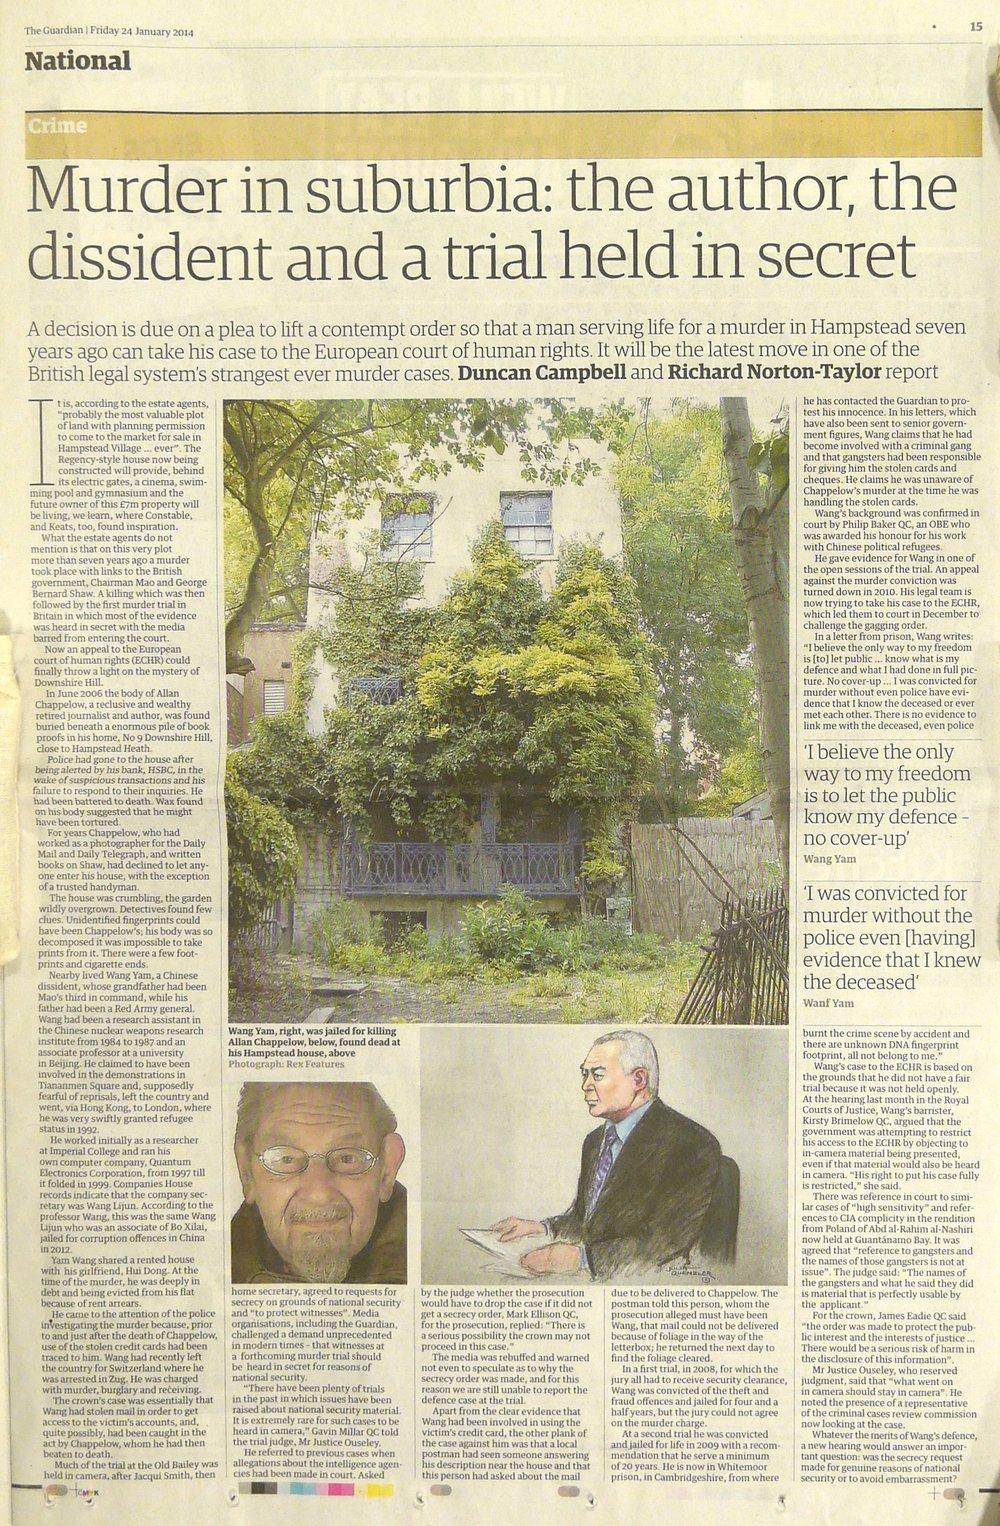 Guardian 23 January 2014